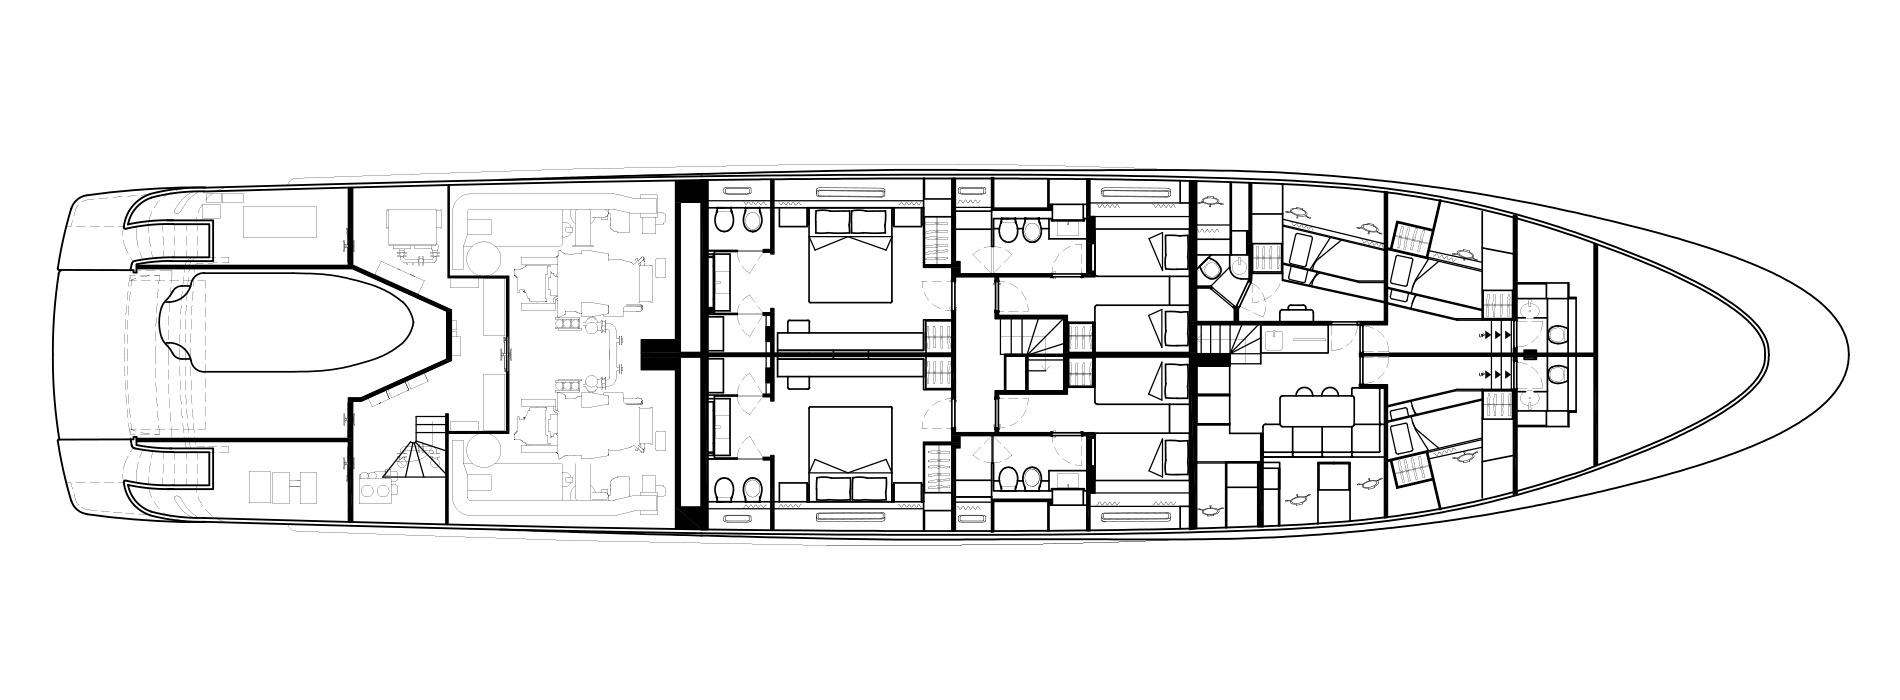 Sanlorenzo Yachts SD126 Lower Deck Version A